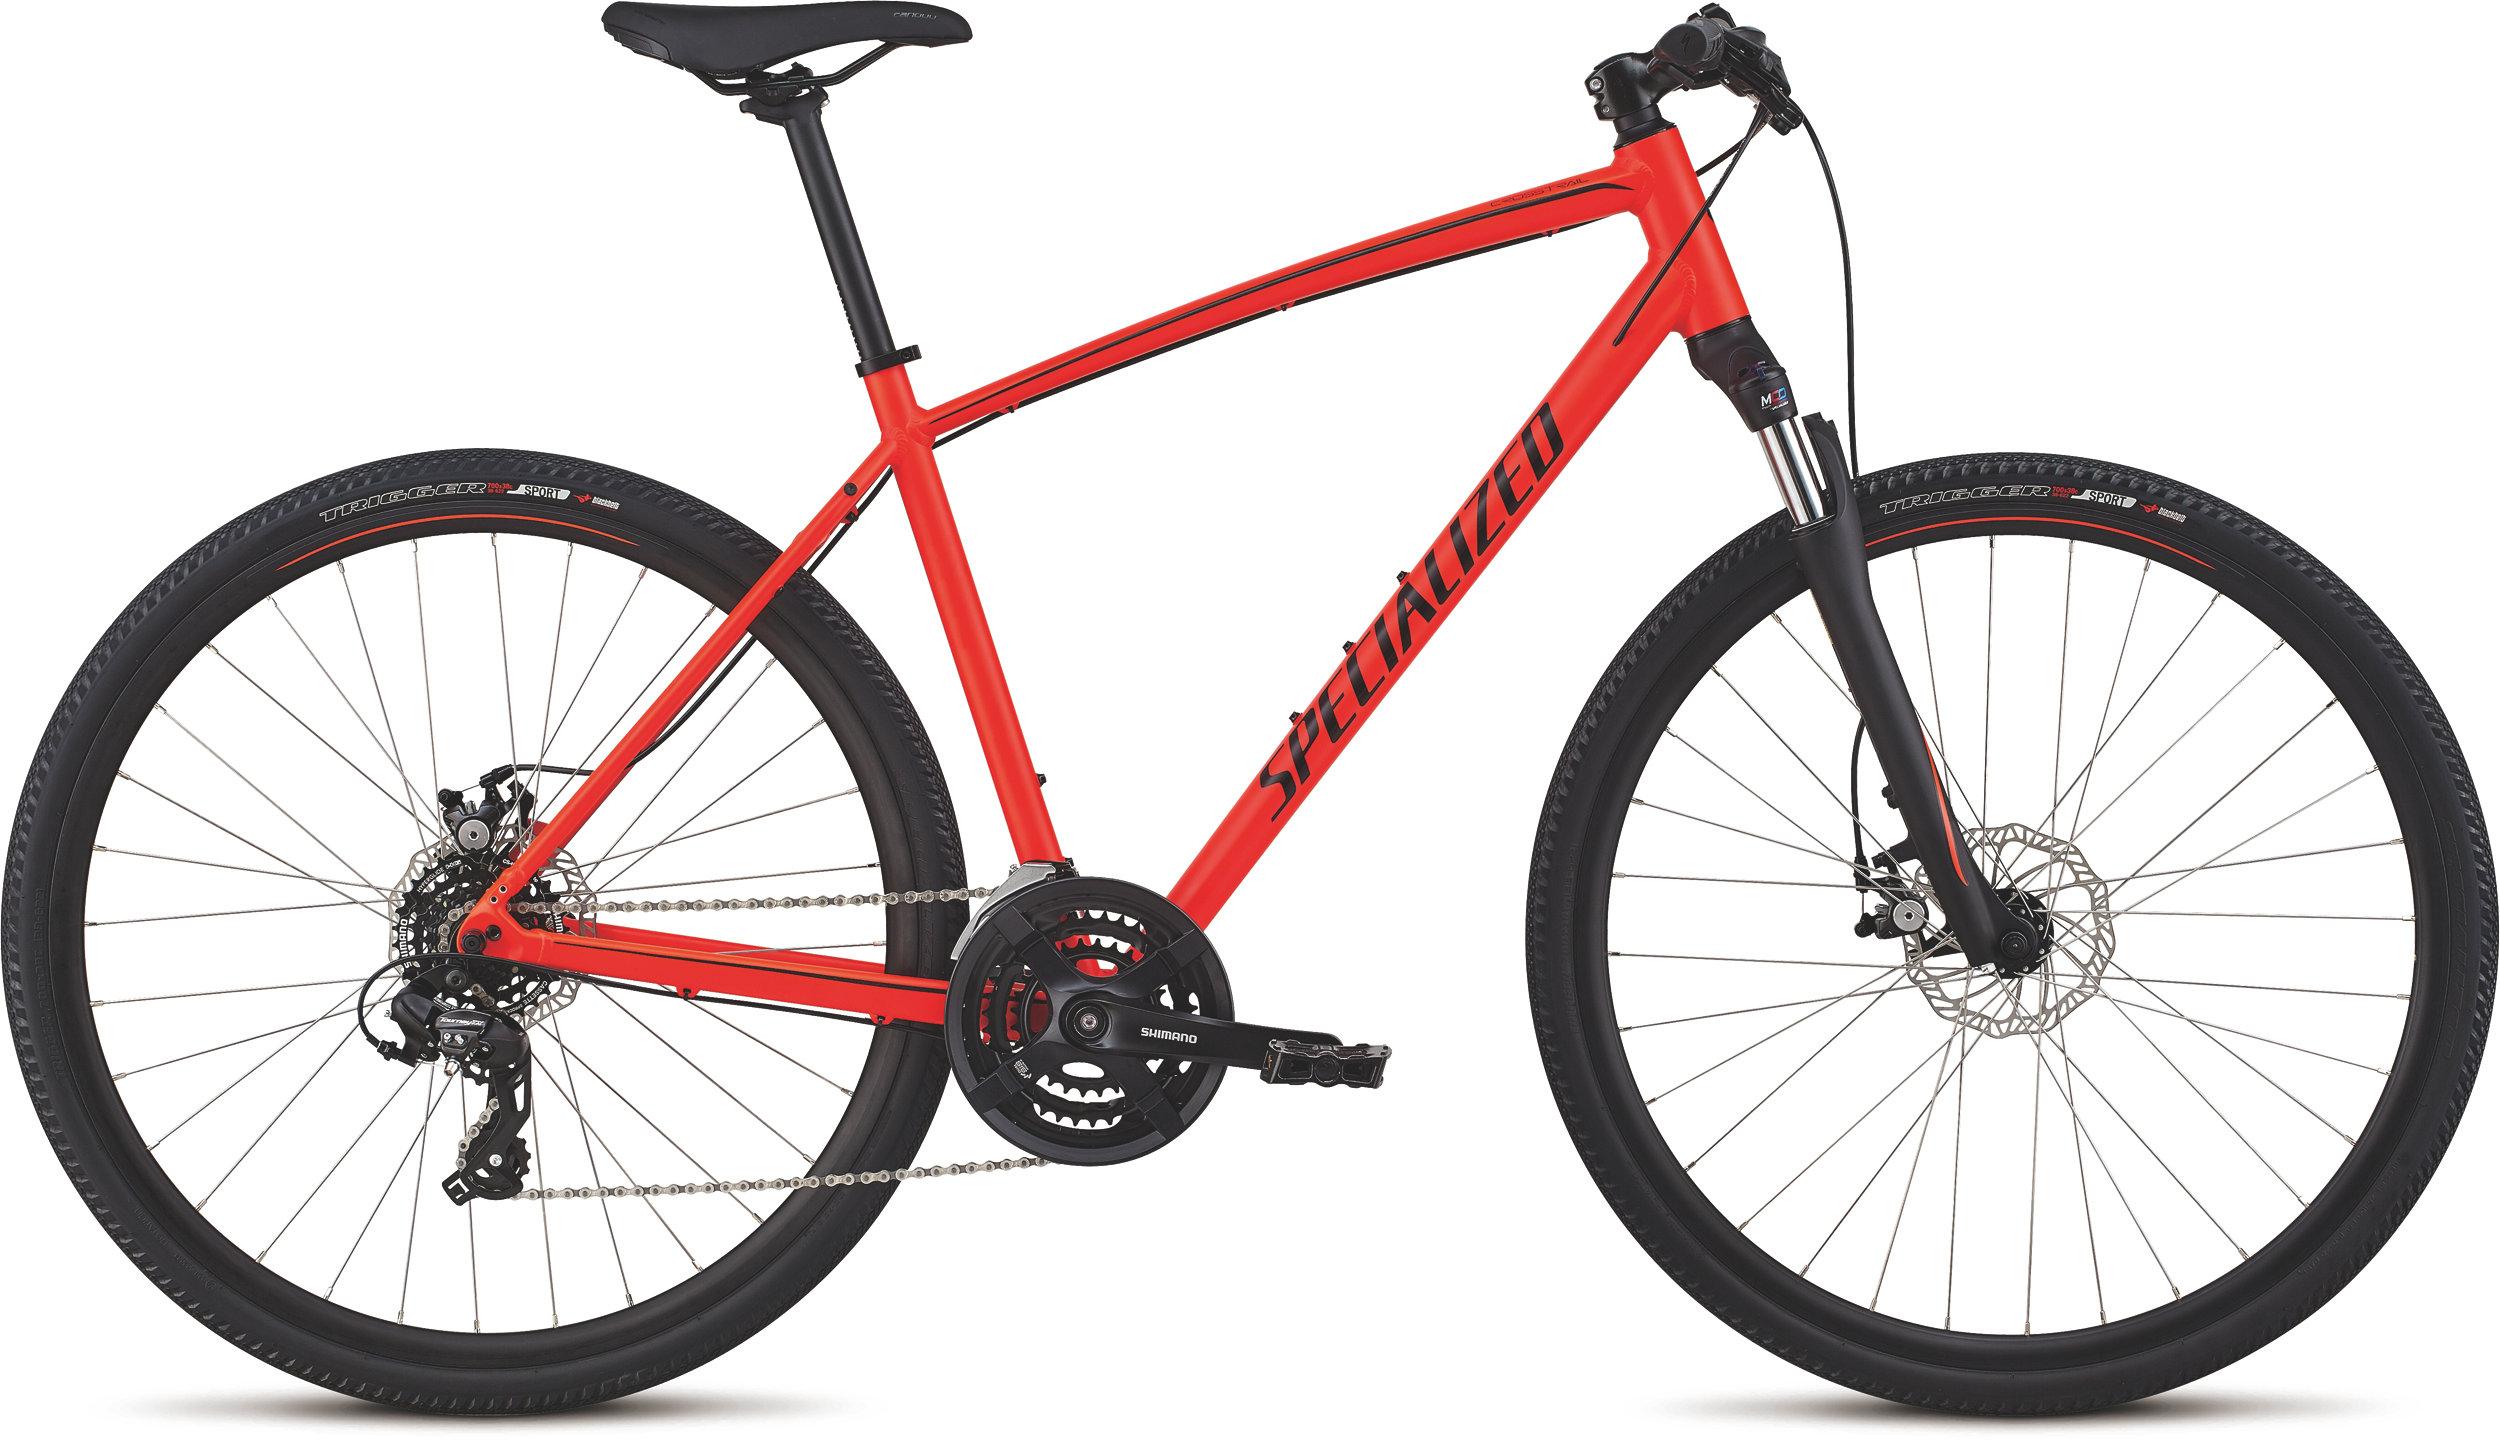 Specialized CrossTrail Mechanical Disc Rocket Red/Limon/Black Reflective L - Pulsschlag Bike+Sport